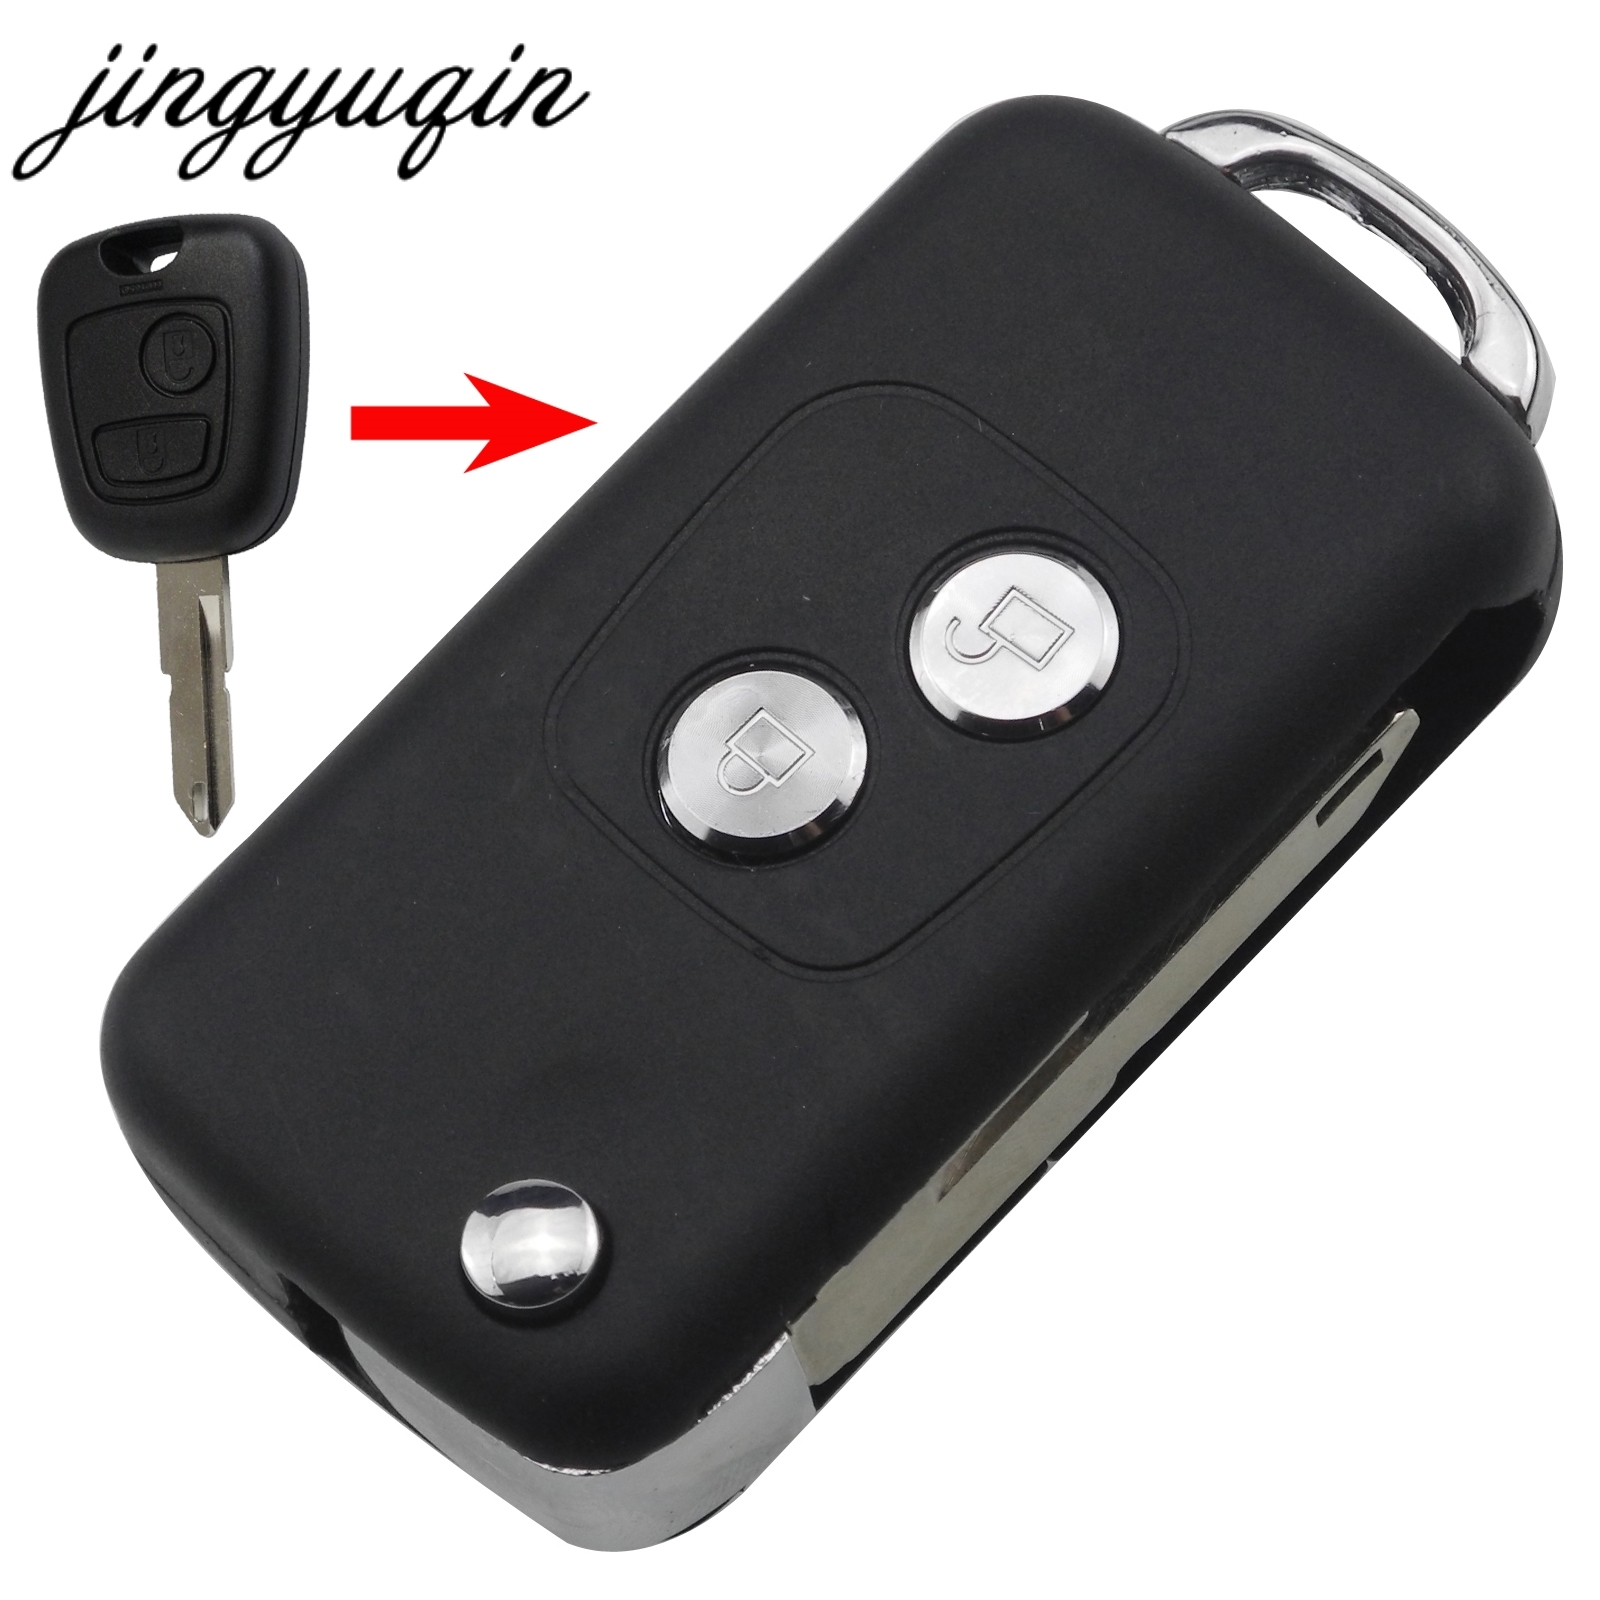 jingyuqin 20pcs lot 2 buttons Modified Flip Folding Key Fob Case for Peugeot 206 207 Citroen